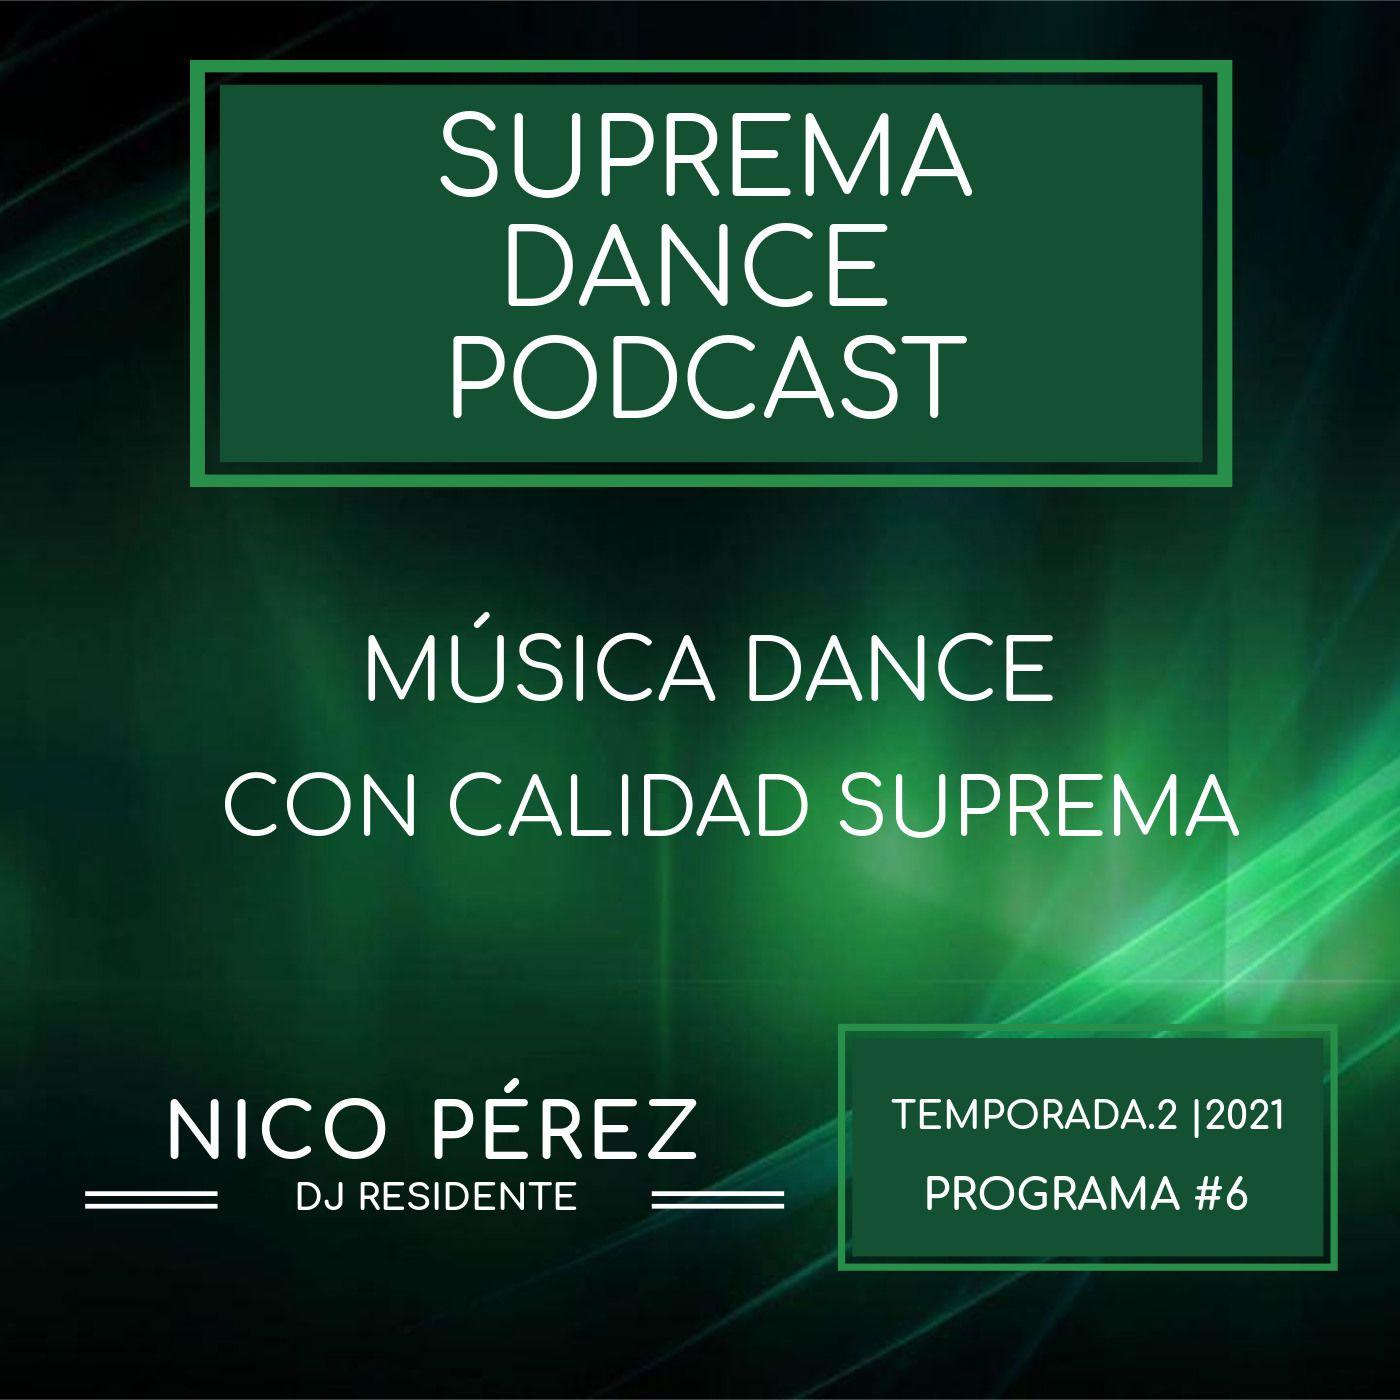 DJ Residente Nico Pérez | Programa-6 | T.2 | SDP